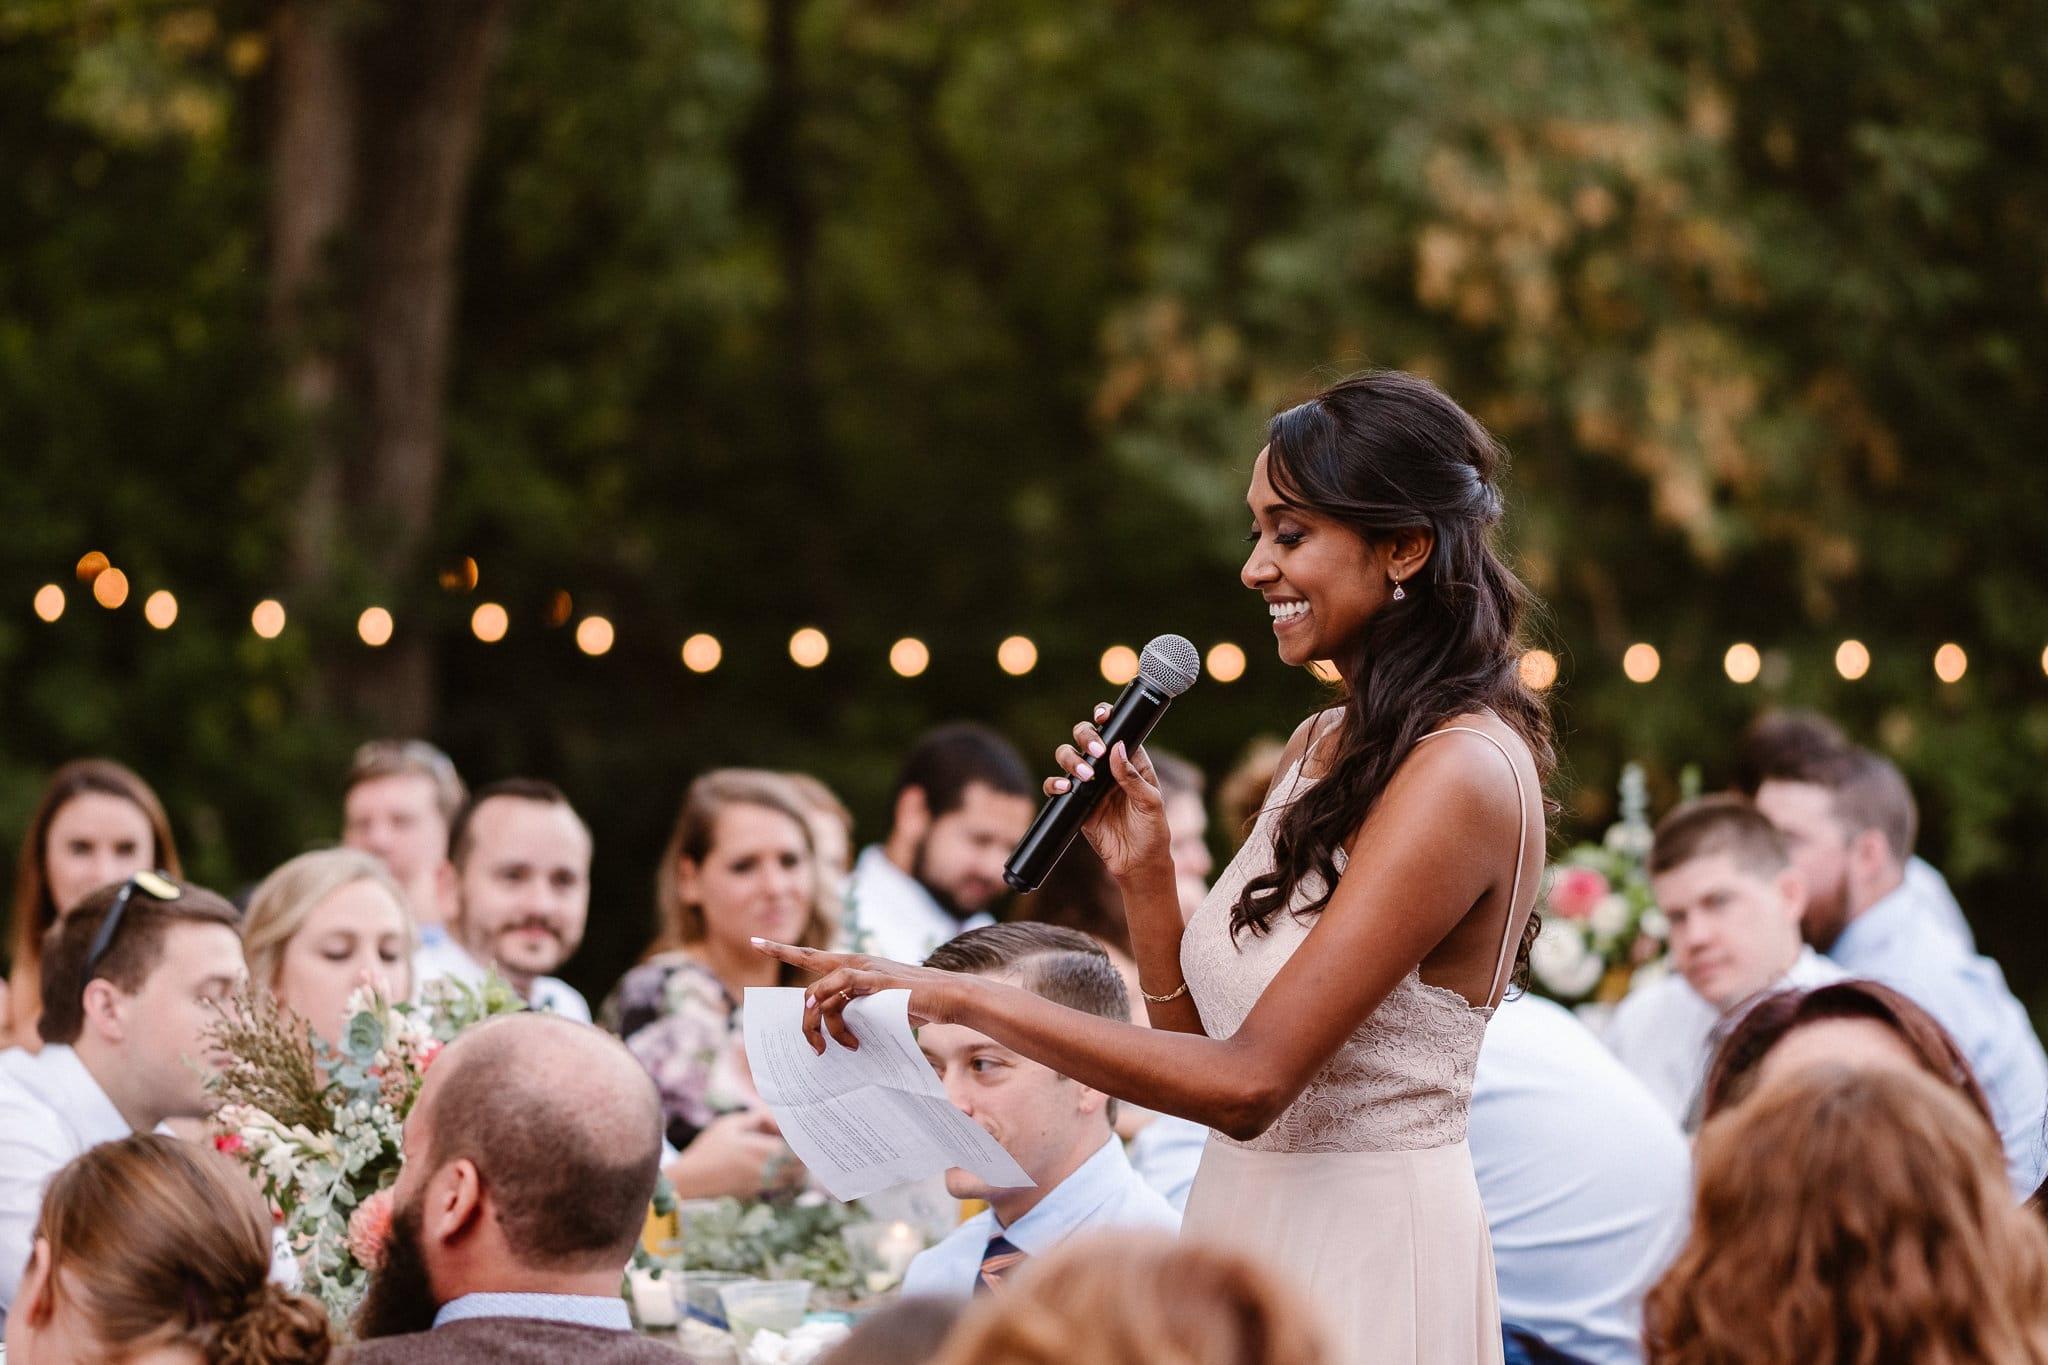 Lyons Farmette wedding photographer, Colorado intimate wedding photographer, wedding toasts, maid of honor toast